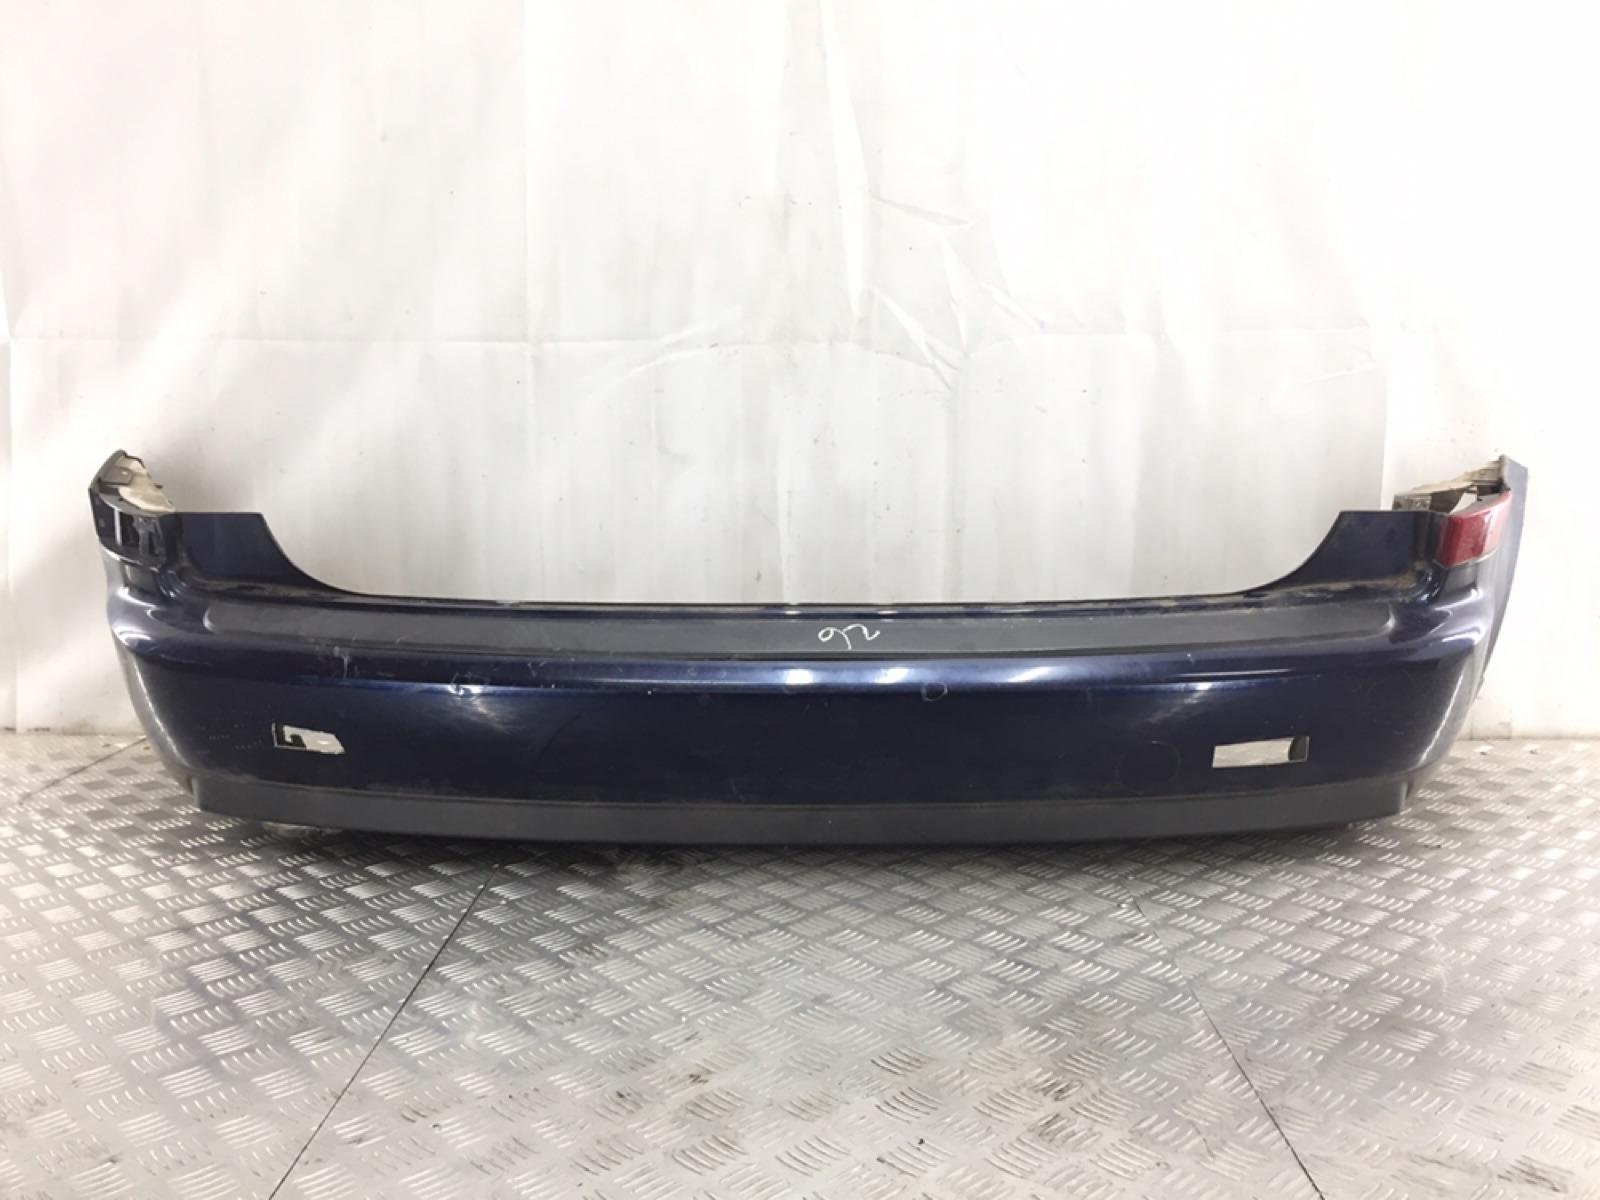 Бампер задний Ford C-Max 1.6 TDCI 2004 (б/у)